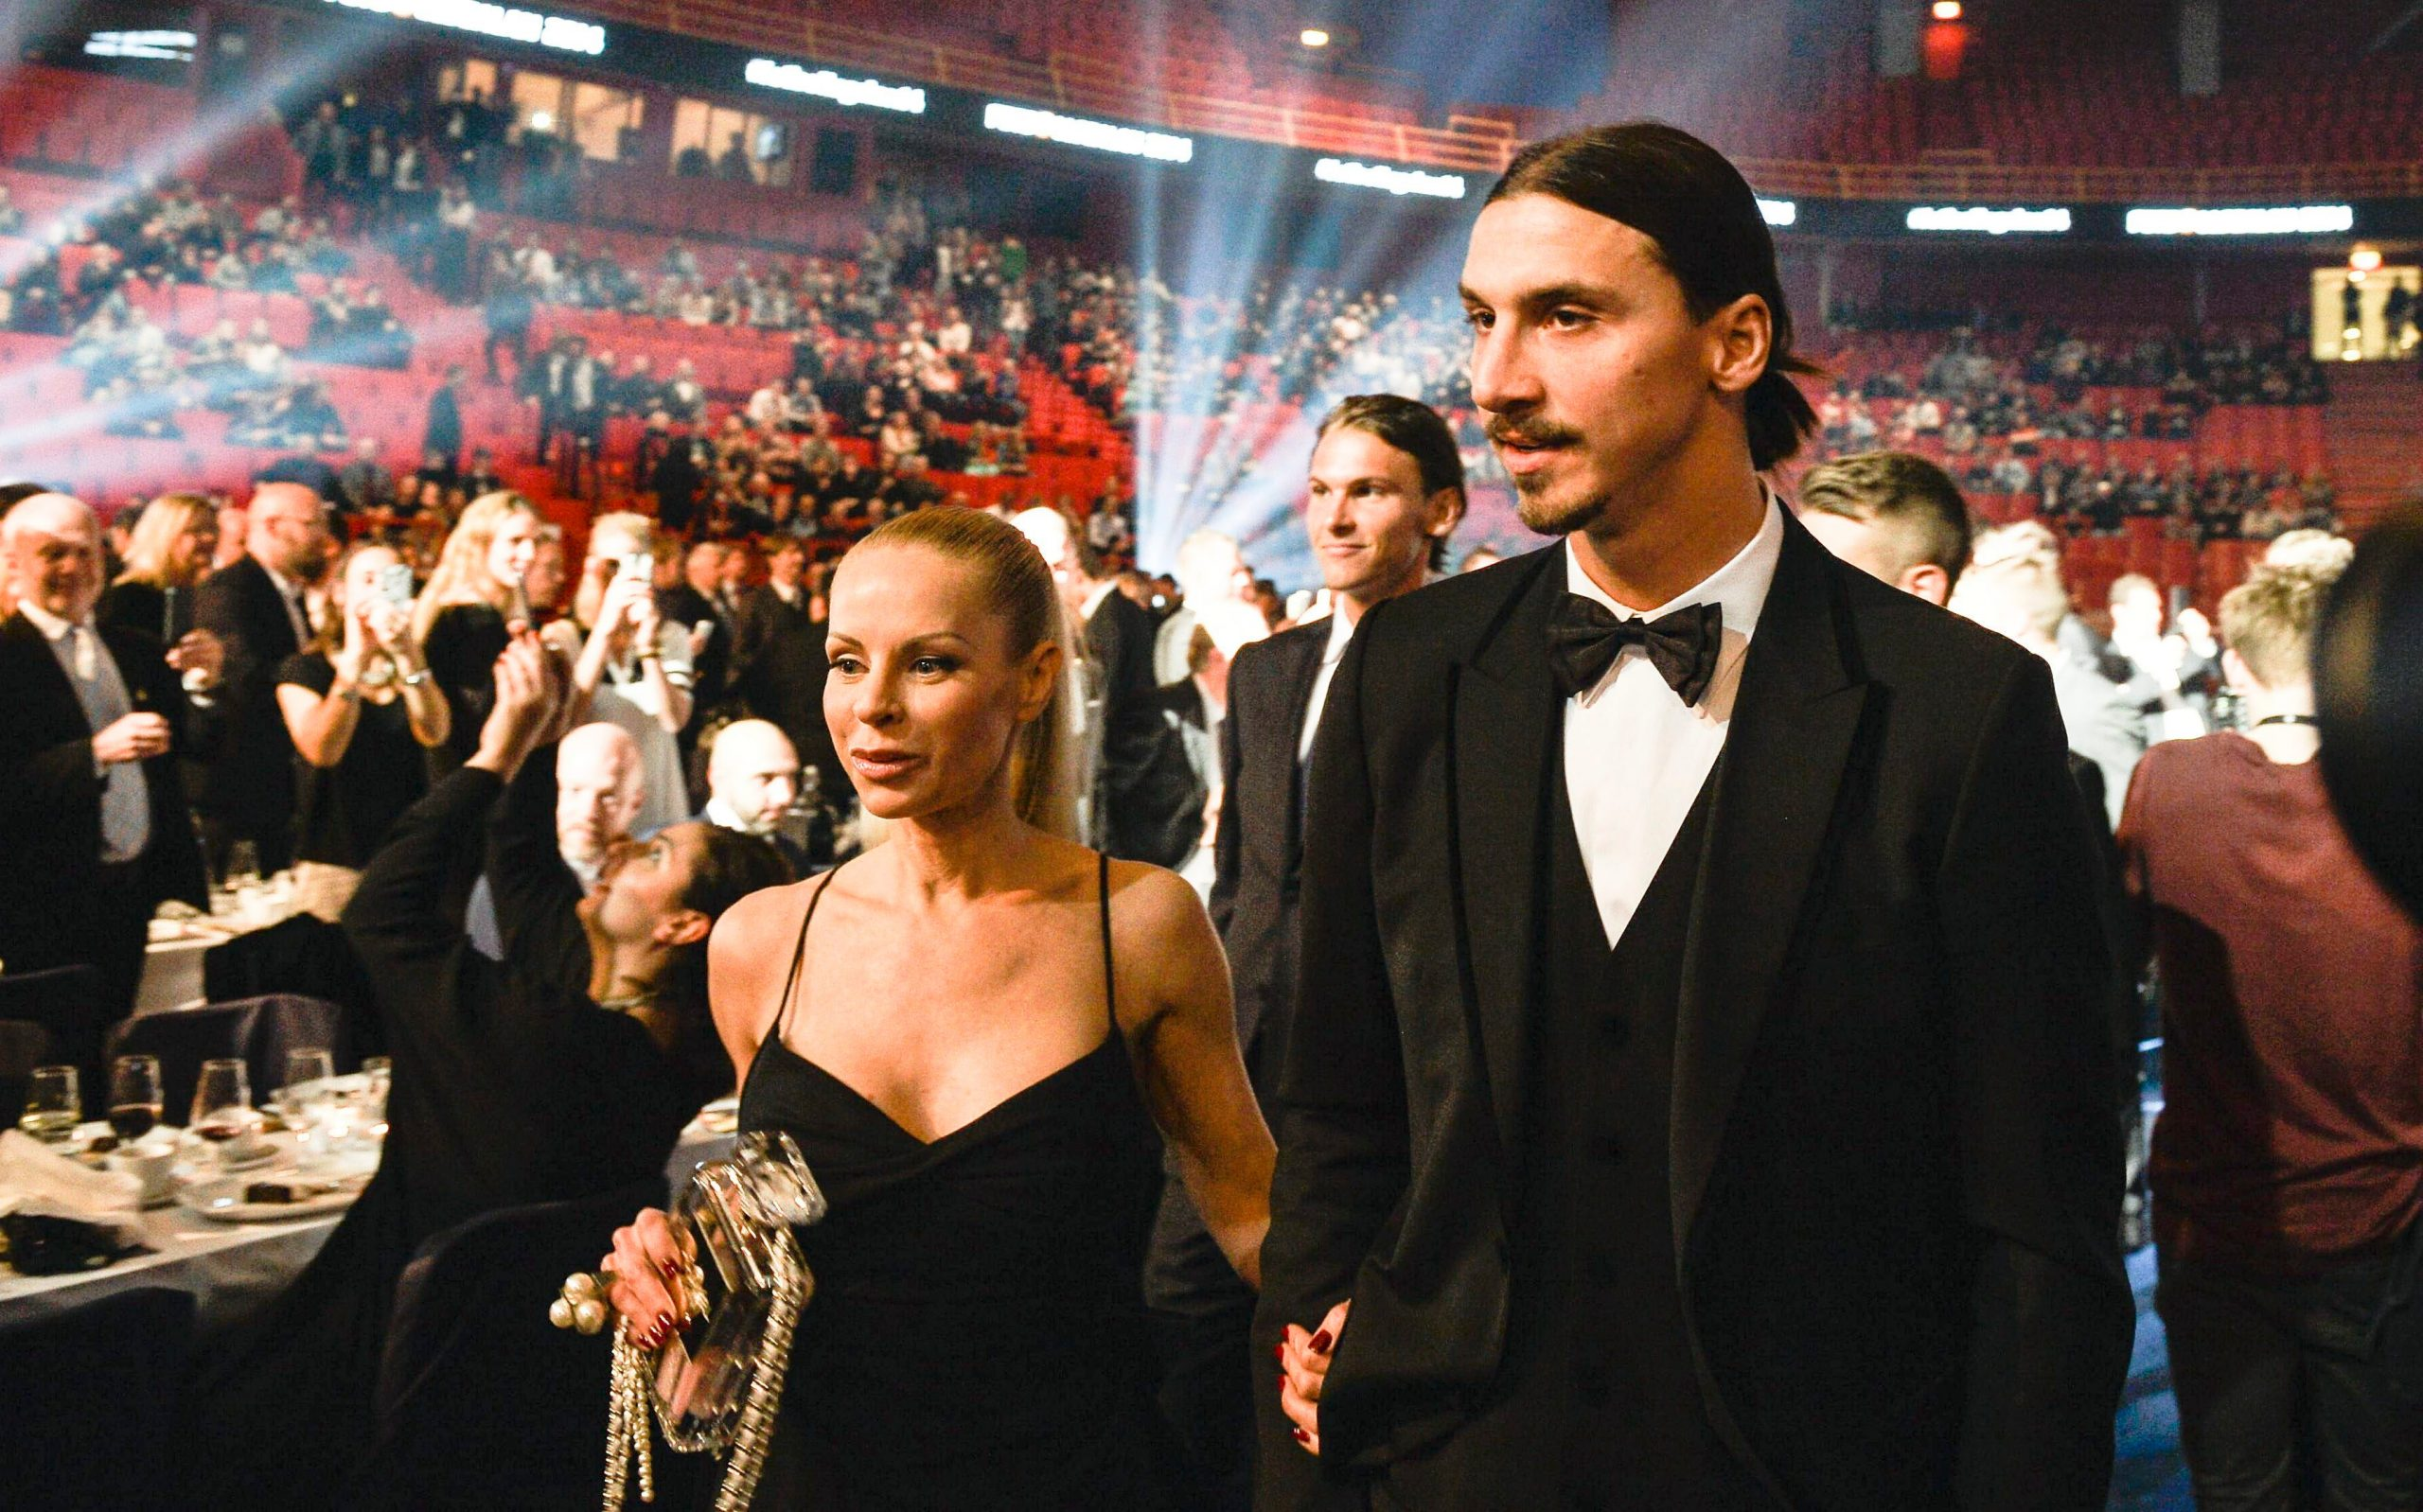 Zlatan Ibrahimovic dan Helena Seger